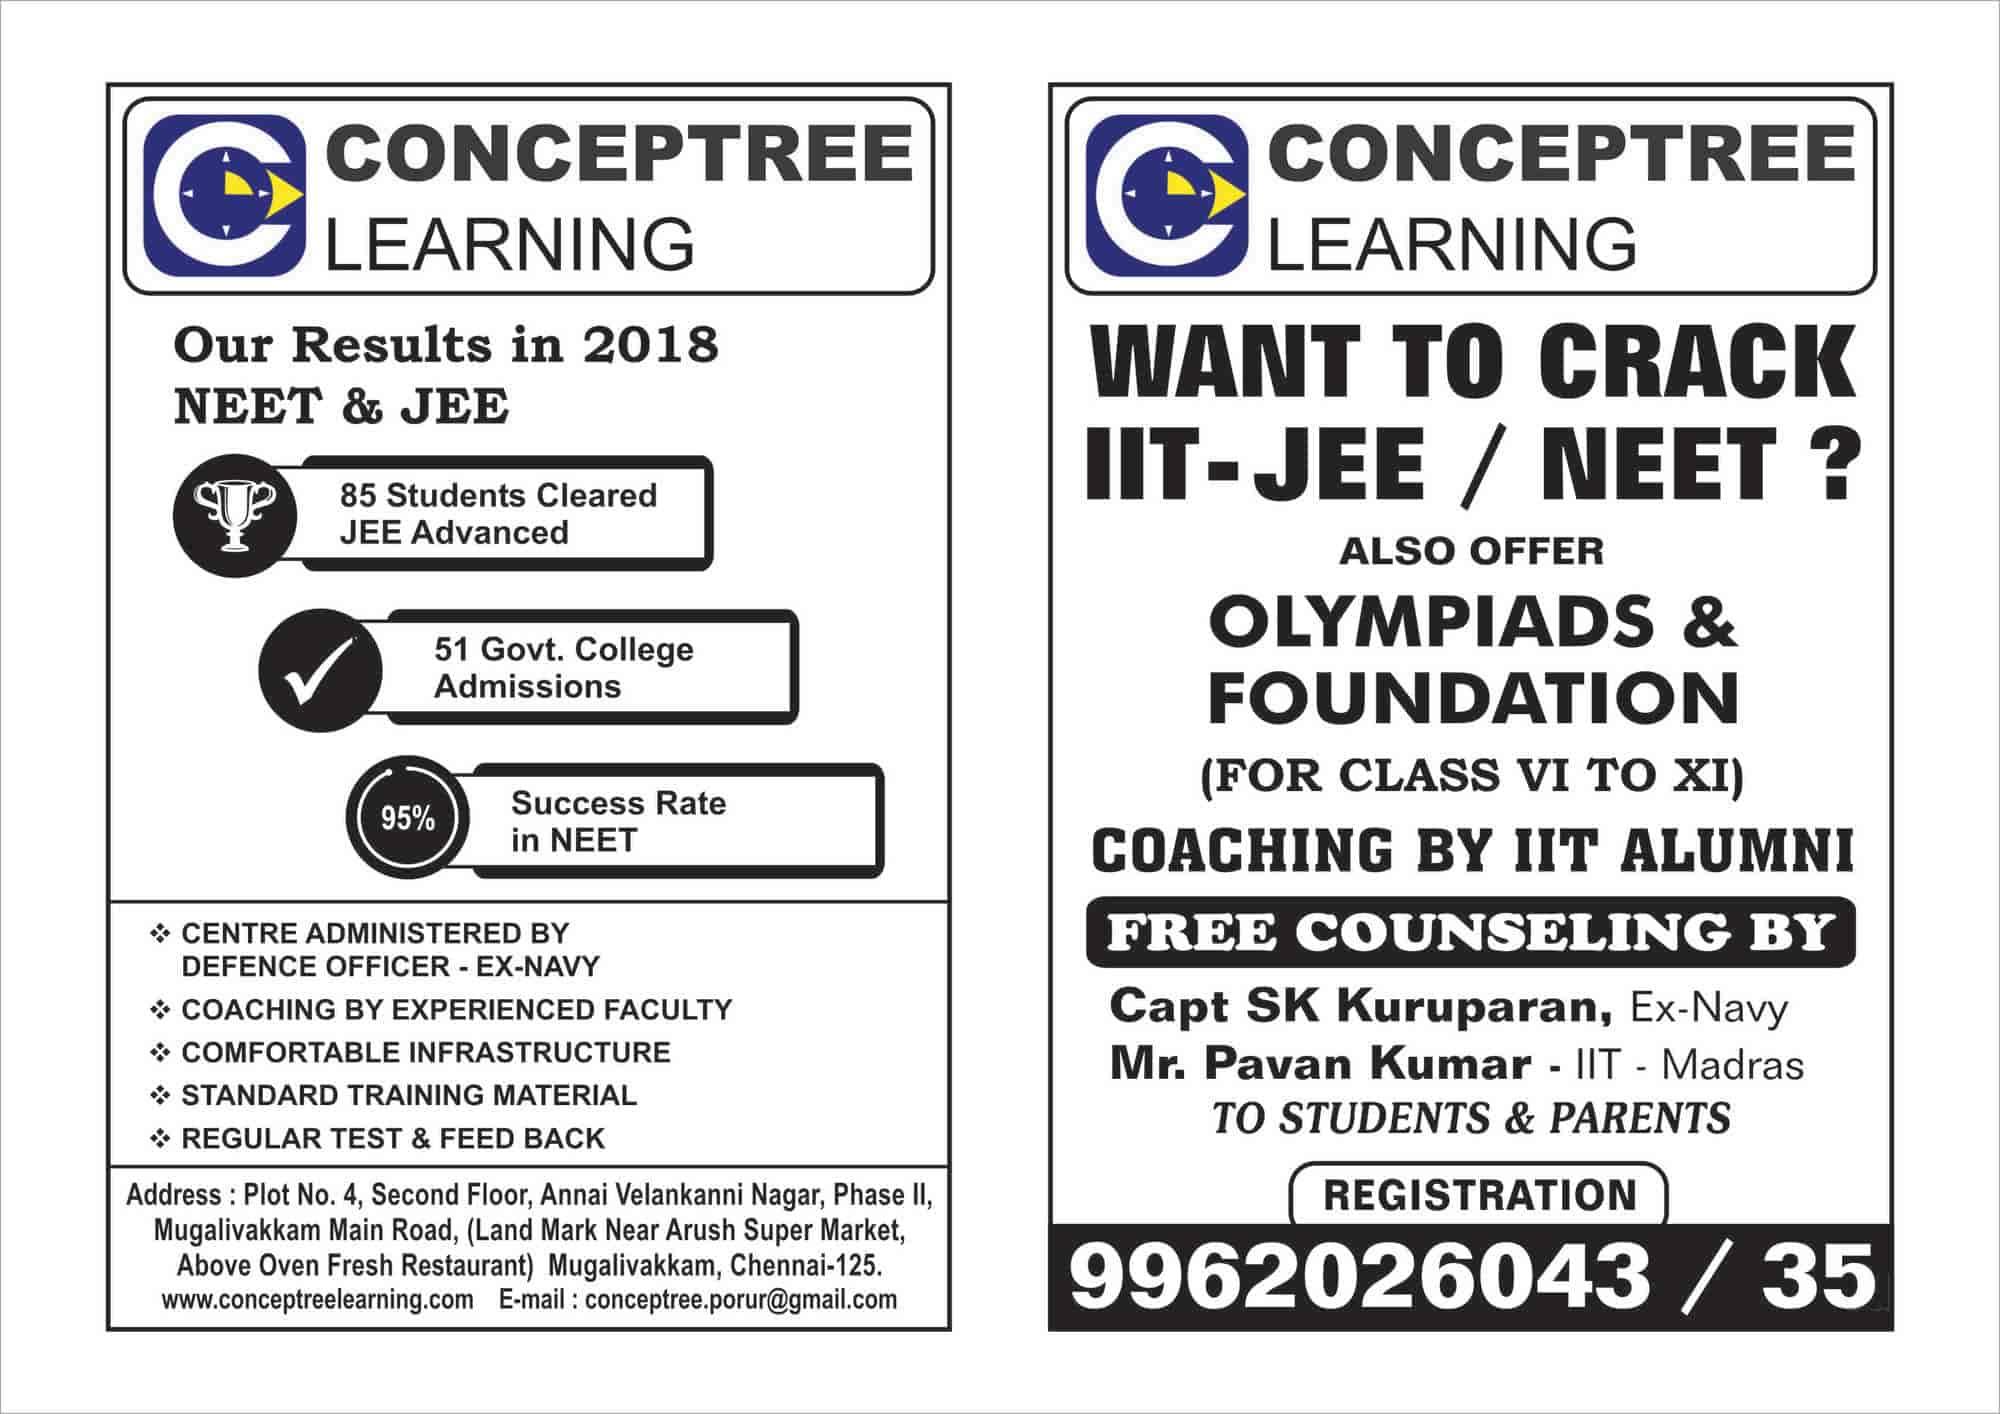 Conceptree Learning (Closed Down) in Mugalivakkam, Chennai